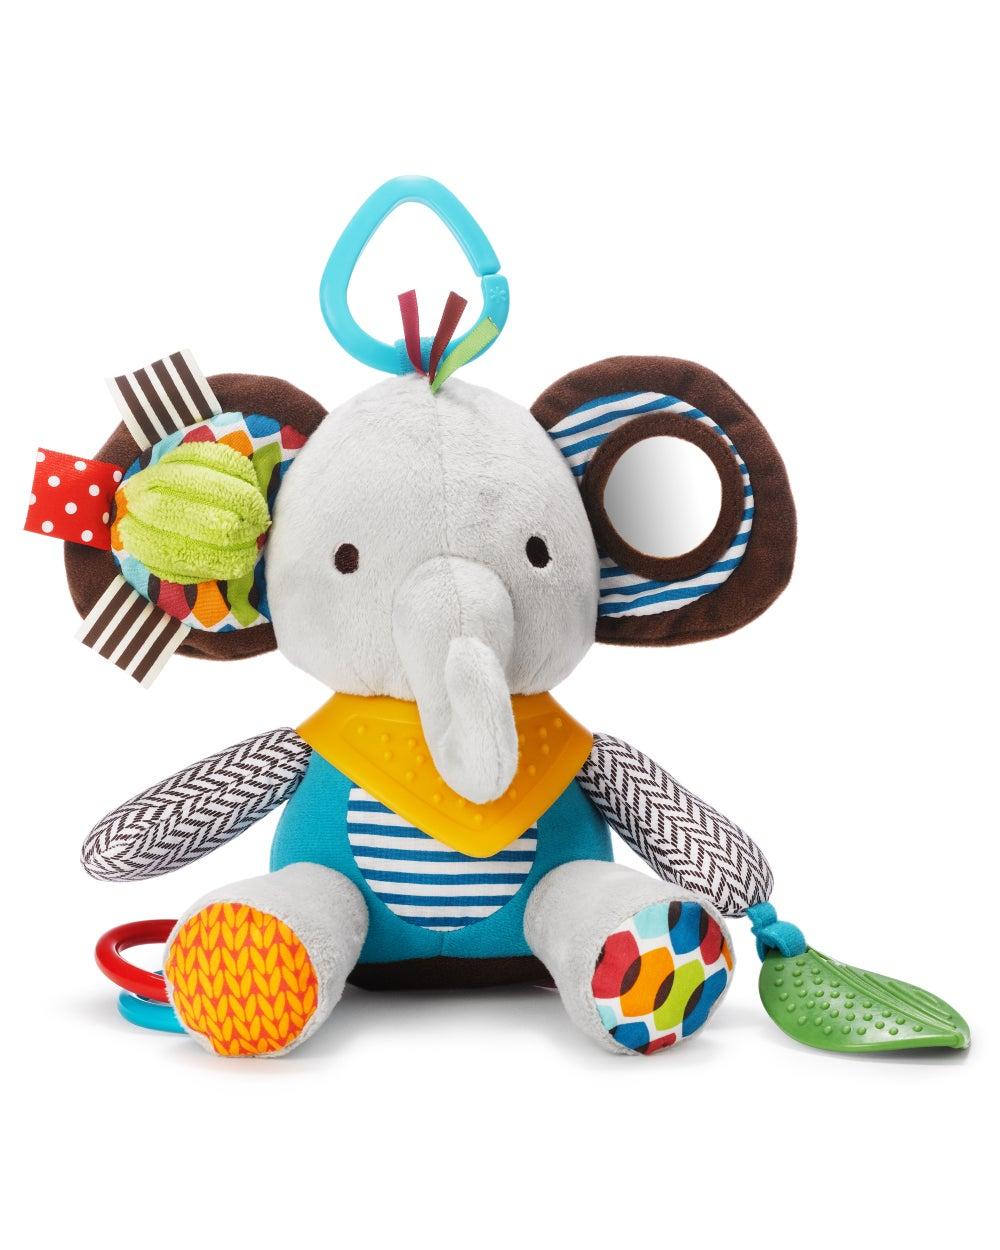 Skip Hop Bandana Buddies - Elephant 807750